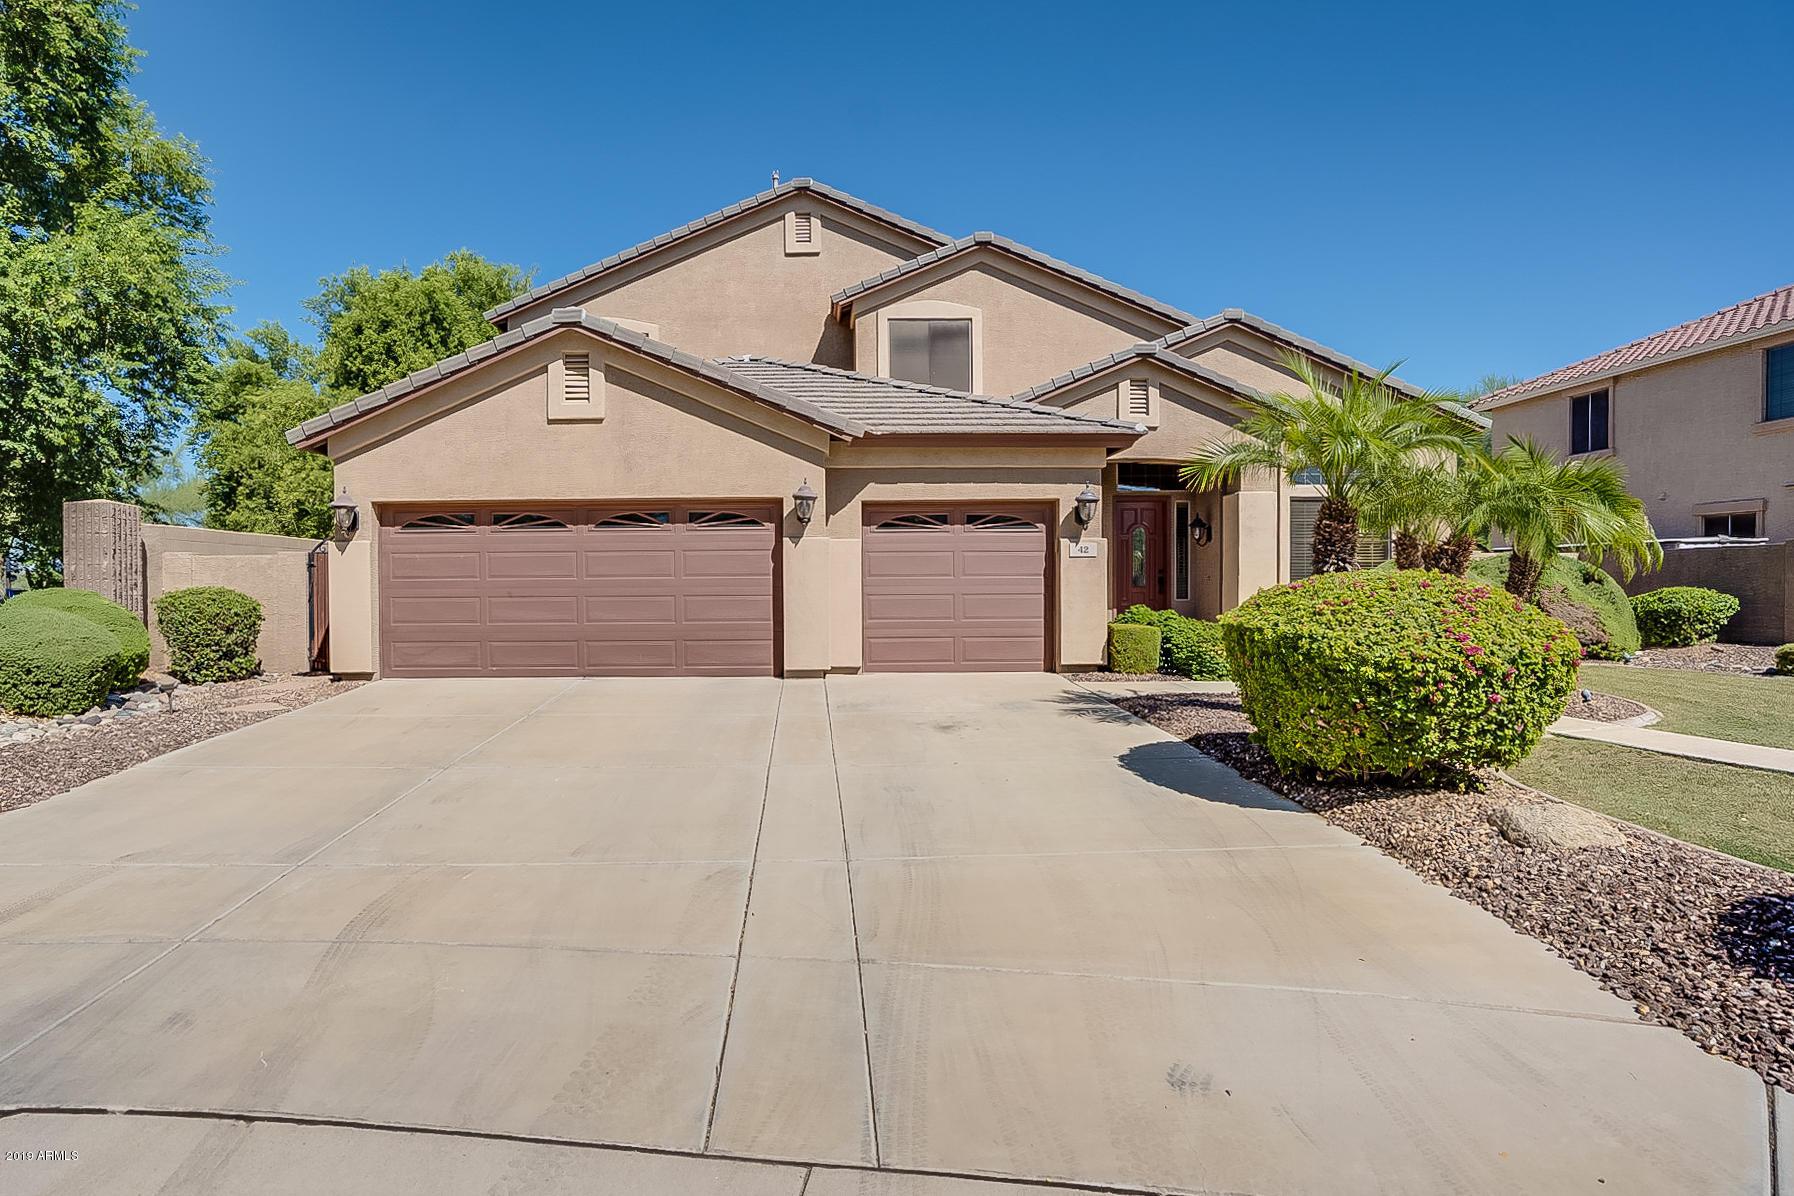 Photo of 42 E BENRICH Drive, Gilbert, AZ 85295